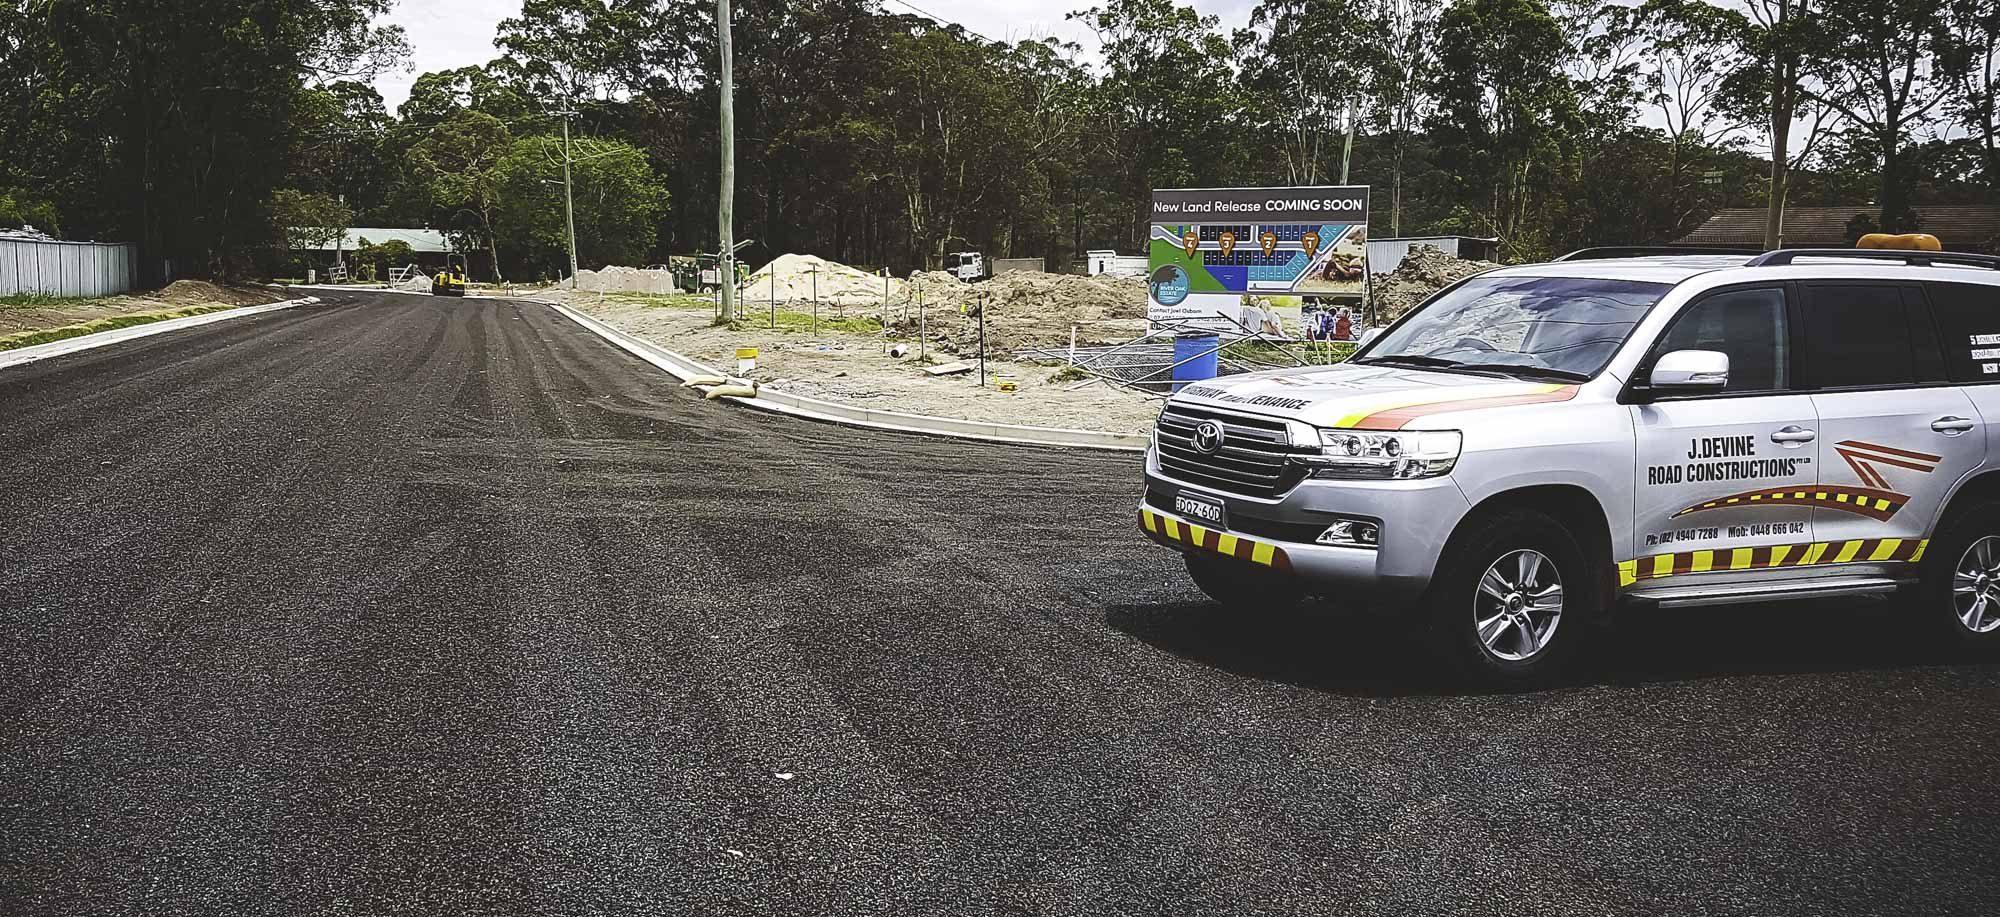 J. Devine Road Constructions